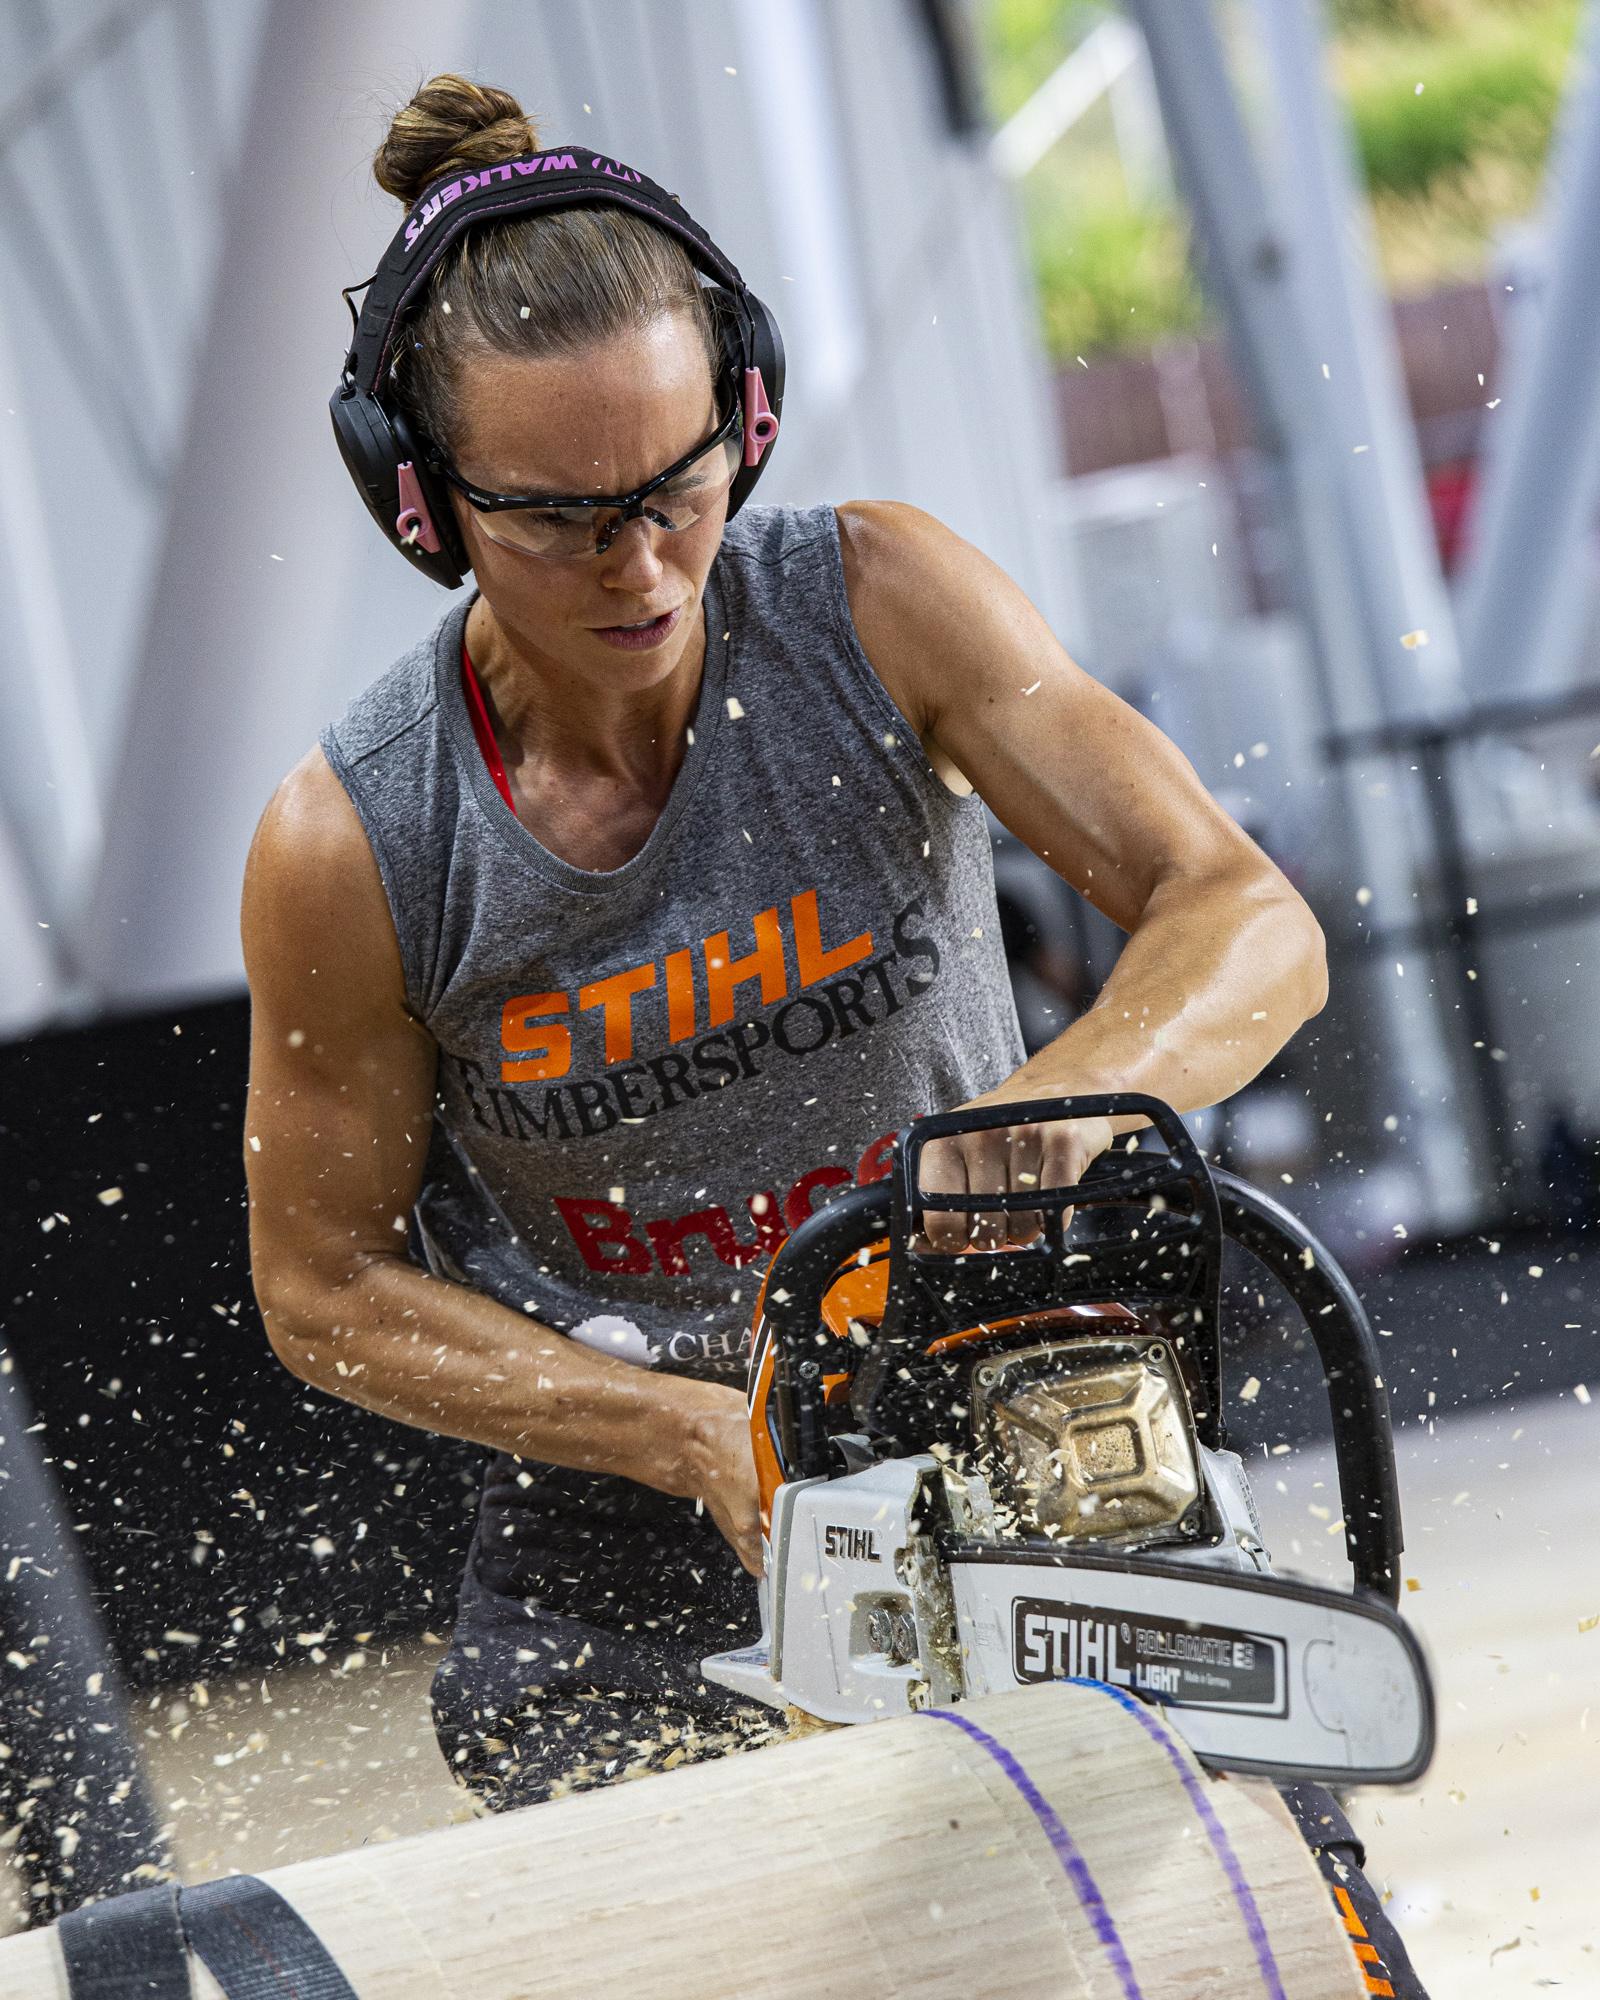 2019 Women's Division Champion Martha King